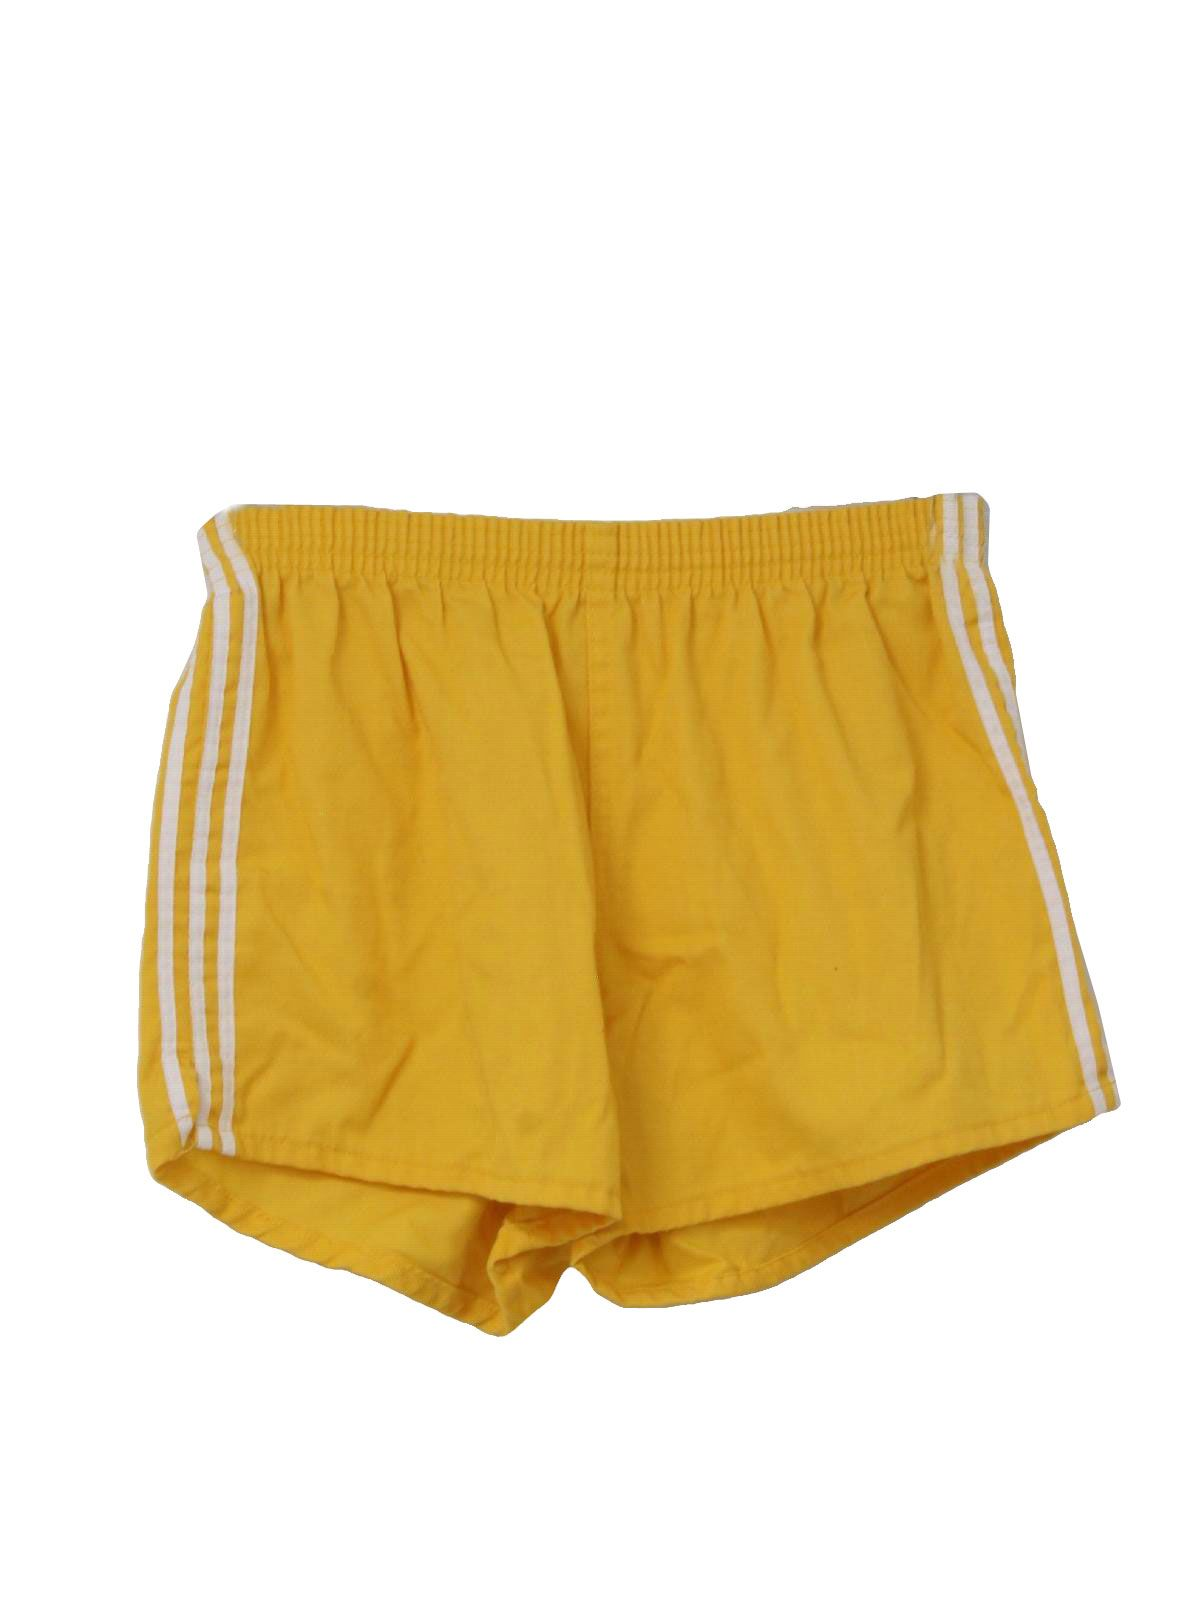 1980 S Mens Totally 80s Gym Shorts Gym Shorts Stripe